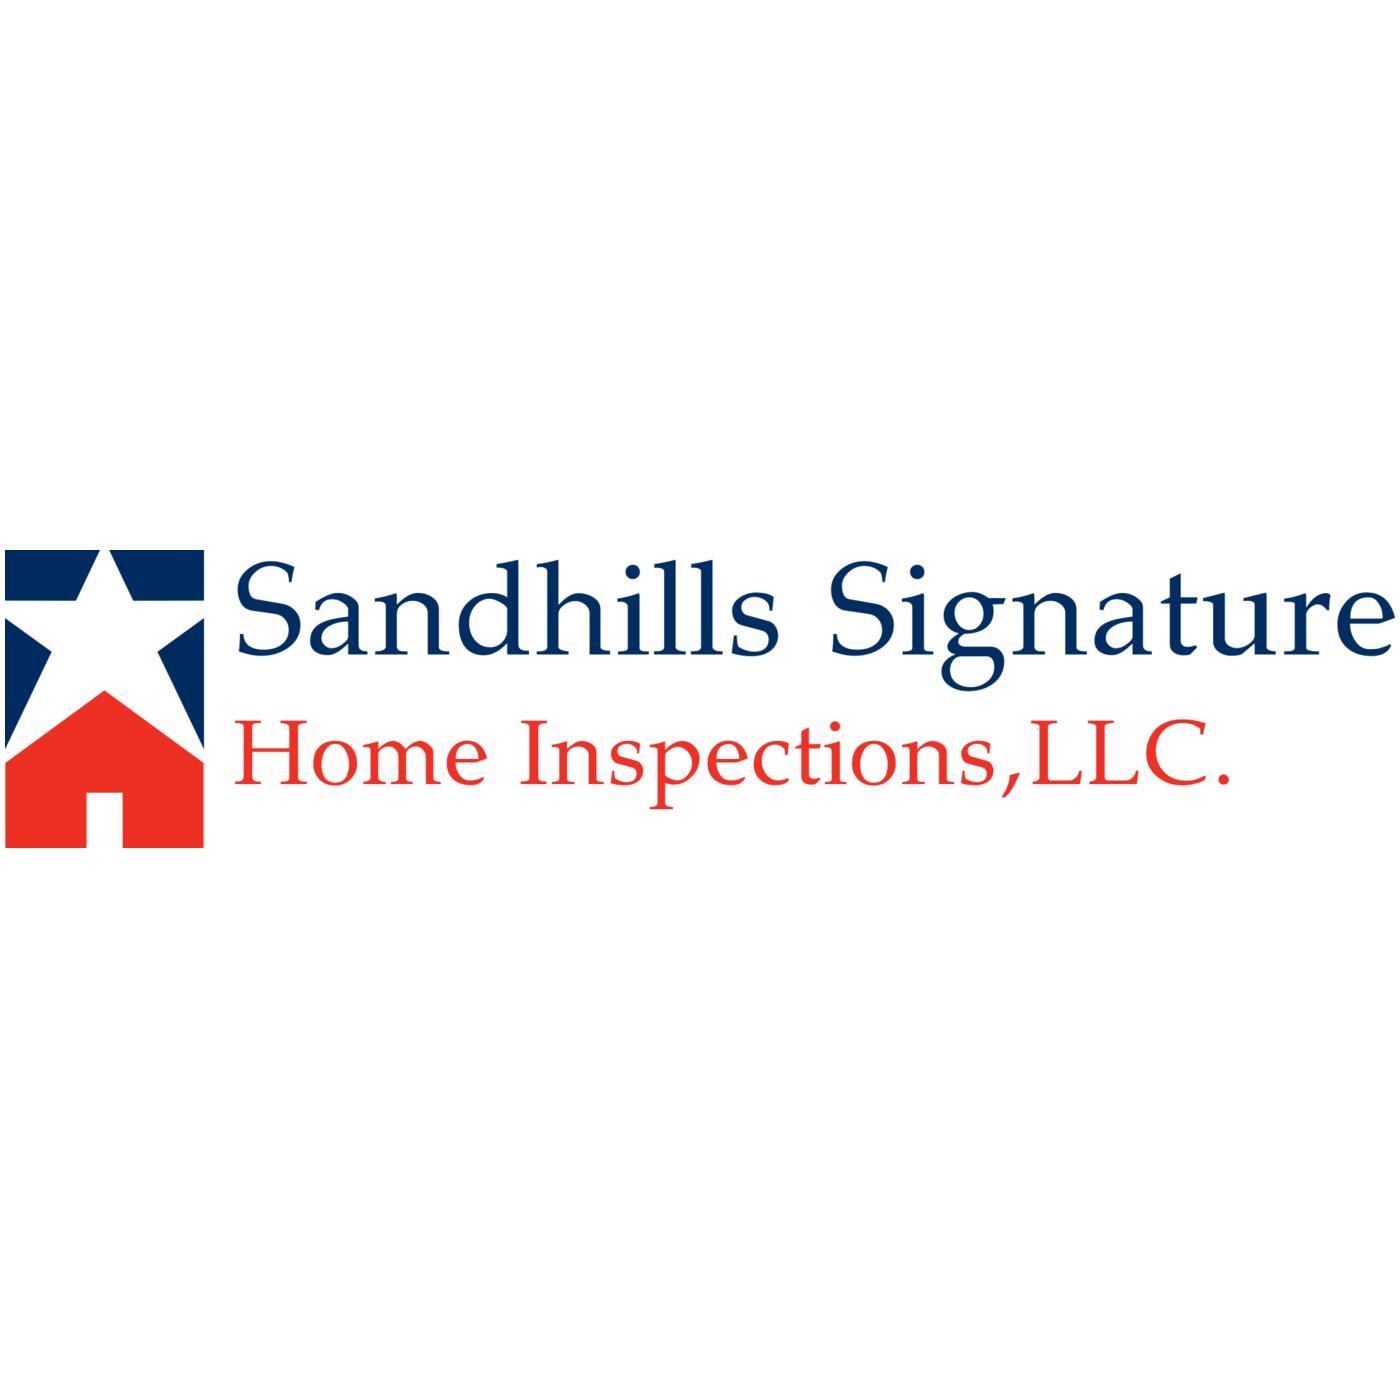 Sandhill's Signature Home Inspections